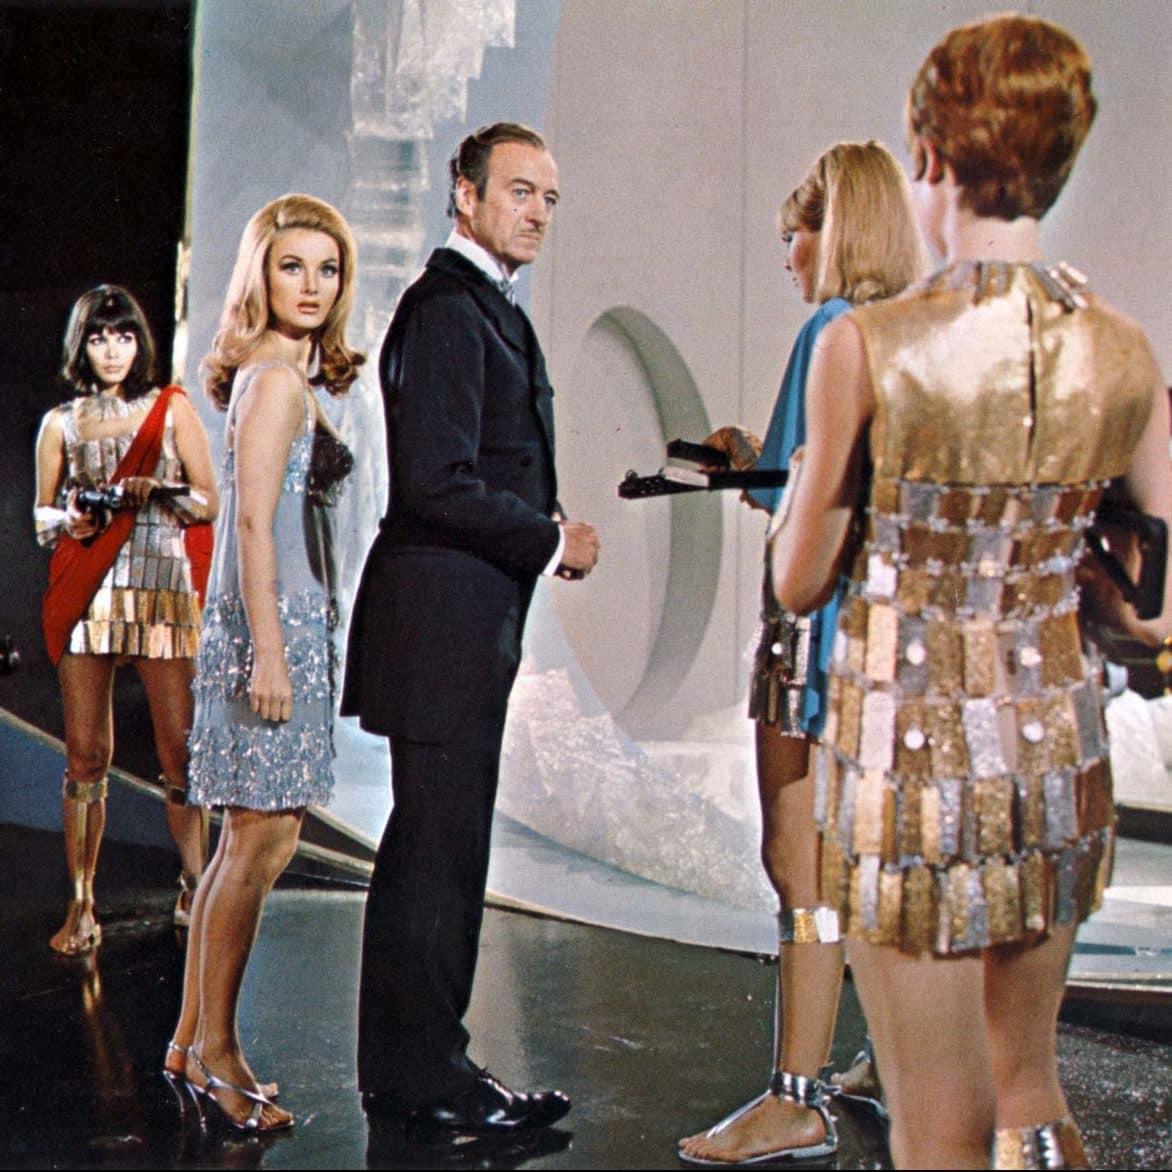 David Niven Barbara Bouchet Casino Royale e1572274859120 20 Groovy Truths You Probably Never Realized About Austin Powers: International Man Of Mystery!